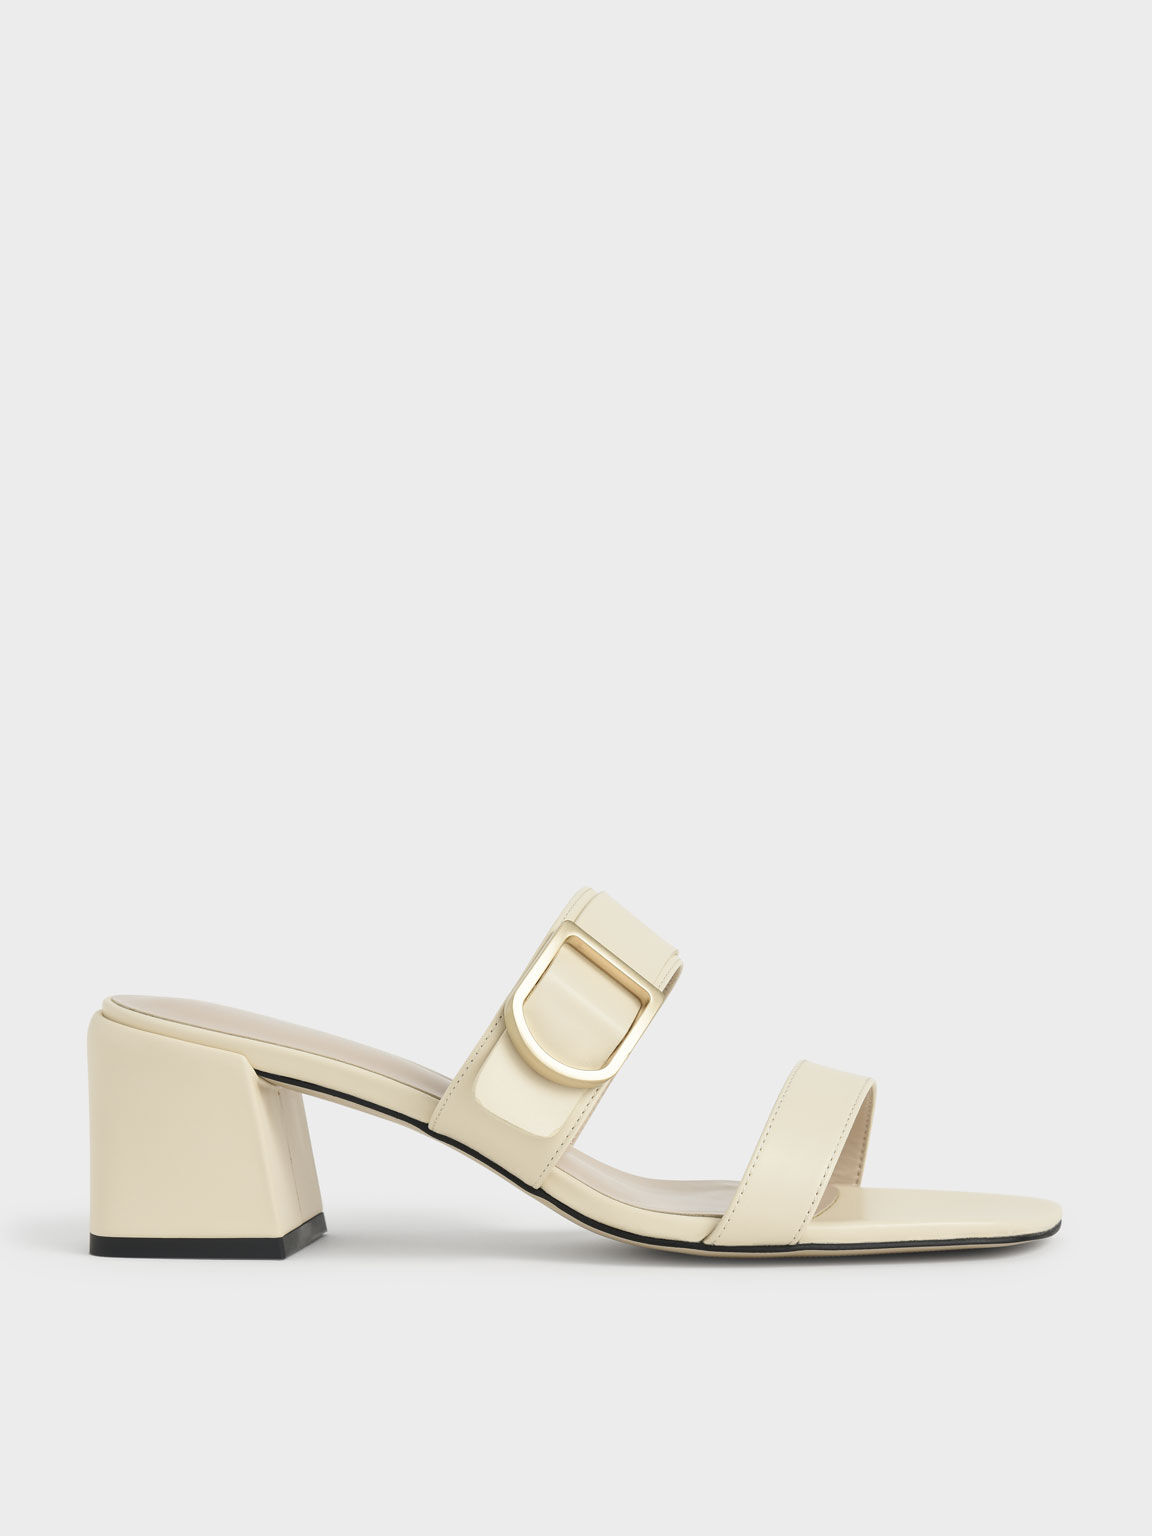 Sepatu Mules Buckle Strap Block Heel, Chalk, hi-res